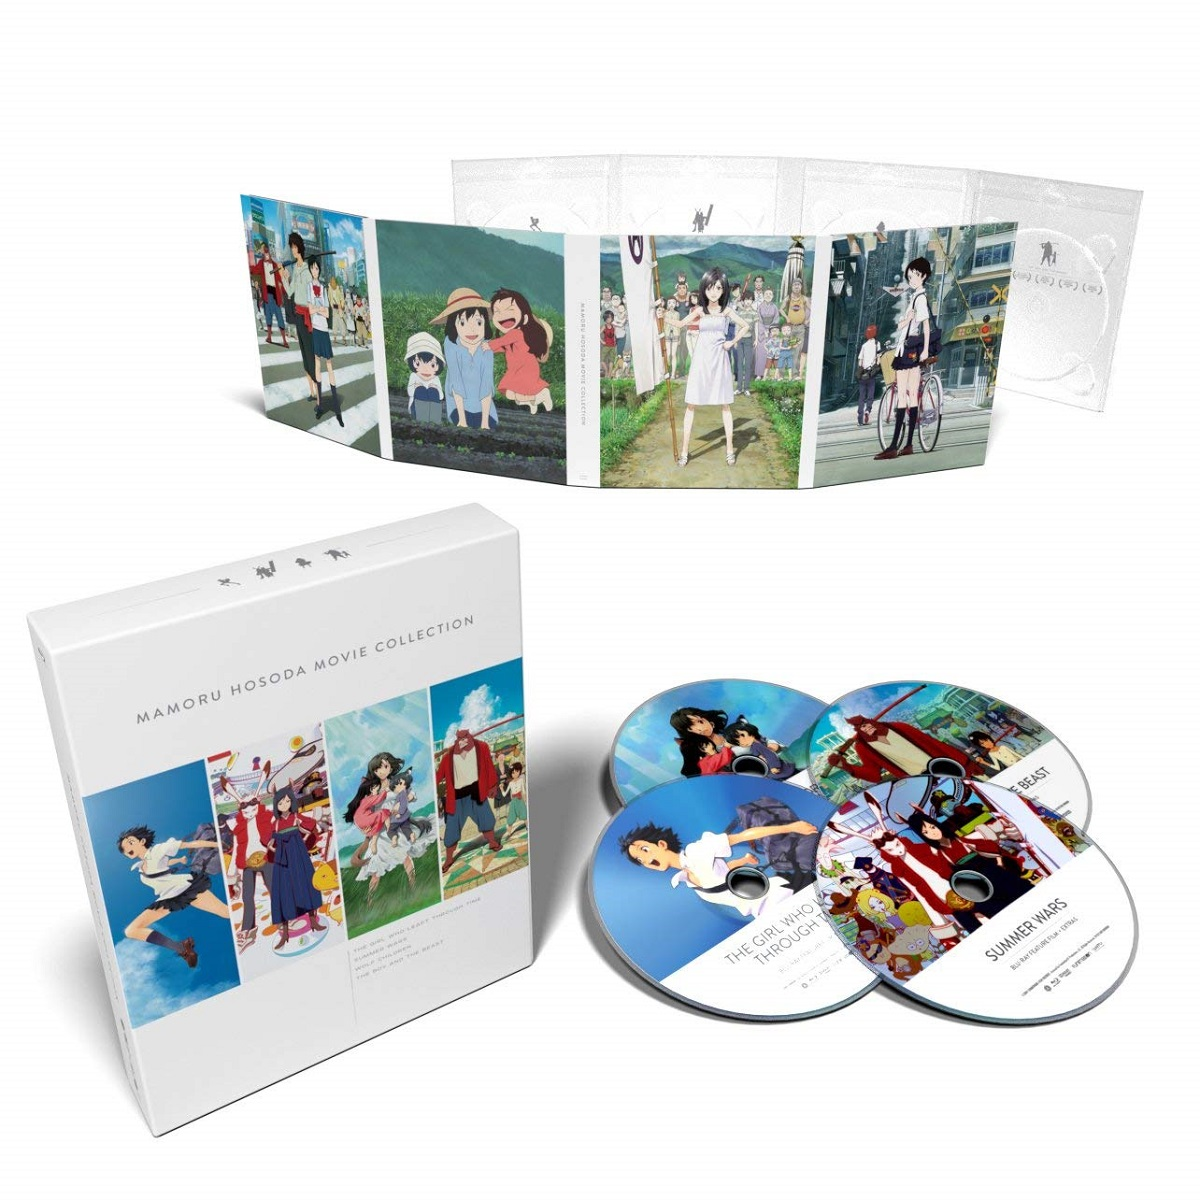 Mamoru Hosoda Movie Collection Blu-ray